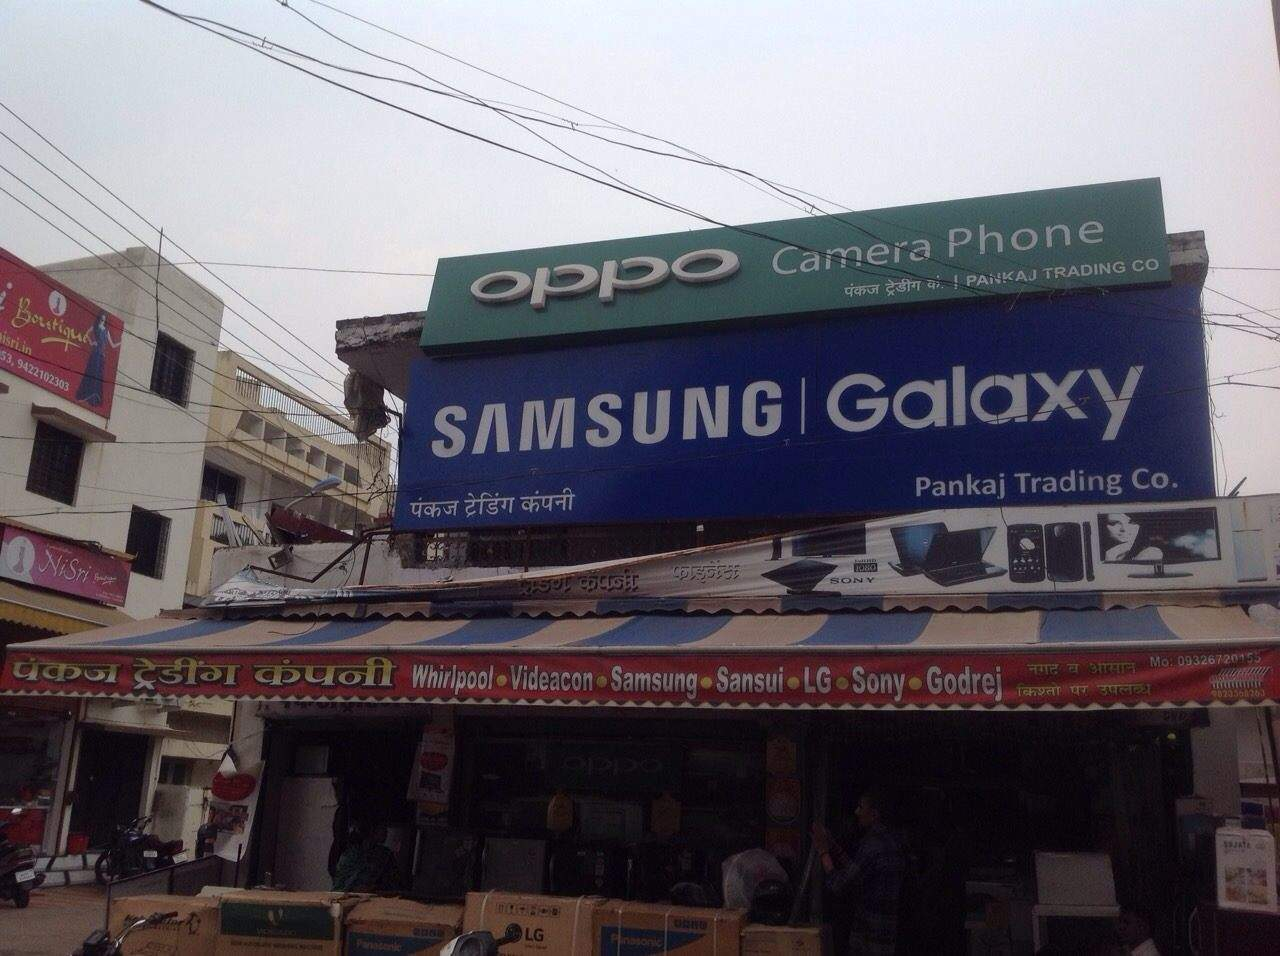 Top 10 Sanyo Tv Dealers in Nagpur - Best Sanyo Tv Dealers